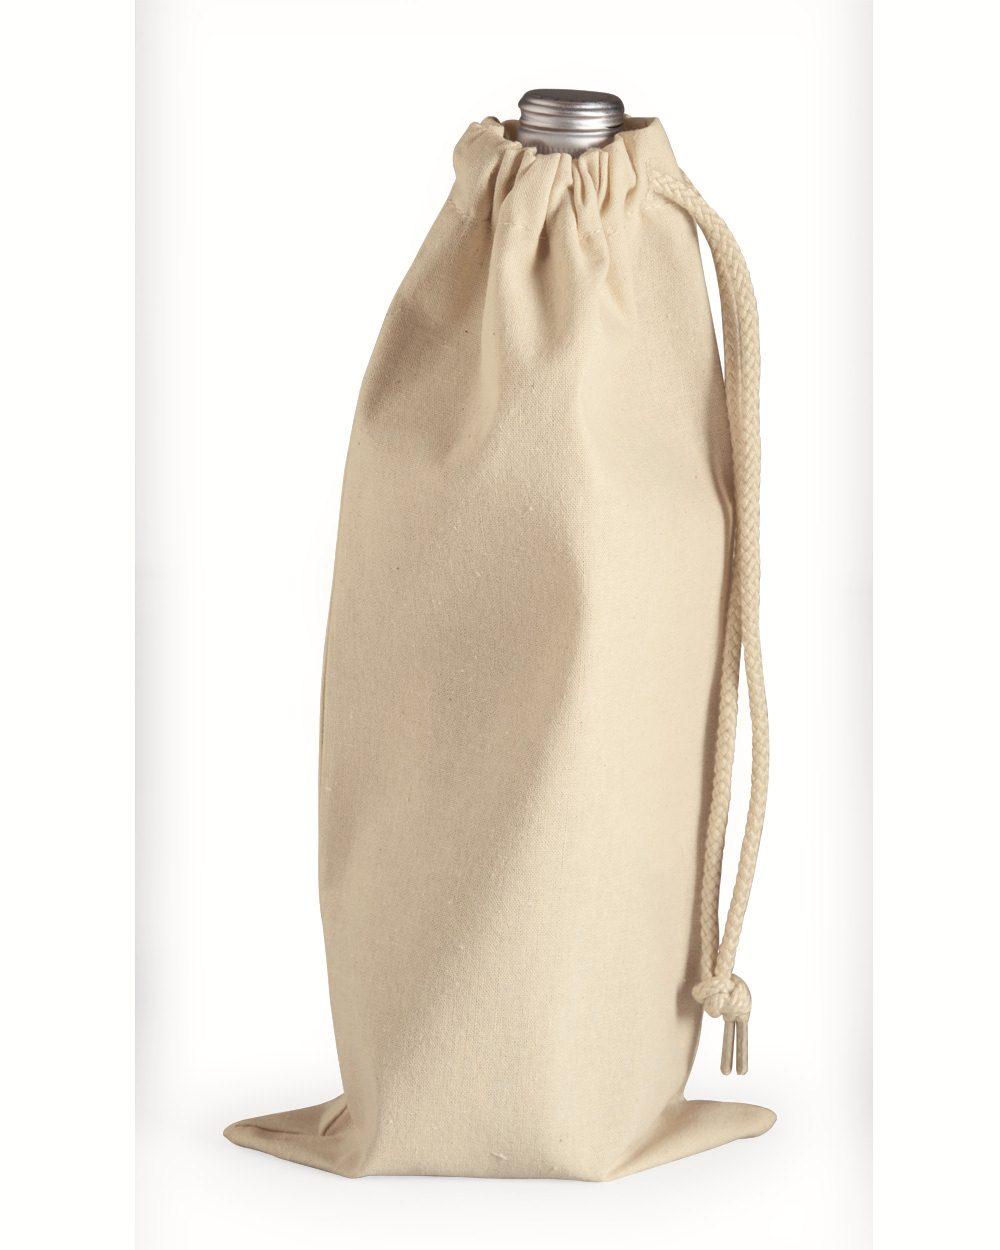 Liberty Bags Drawstring Wine Bag - 1727